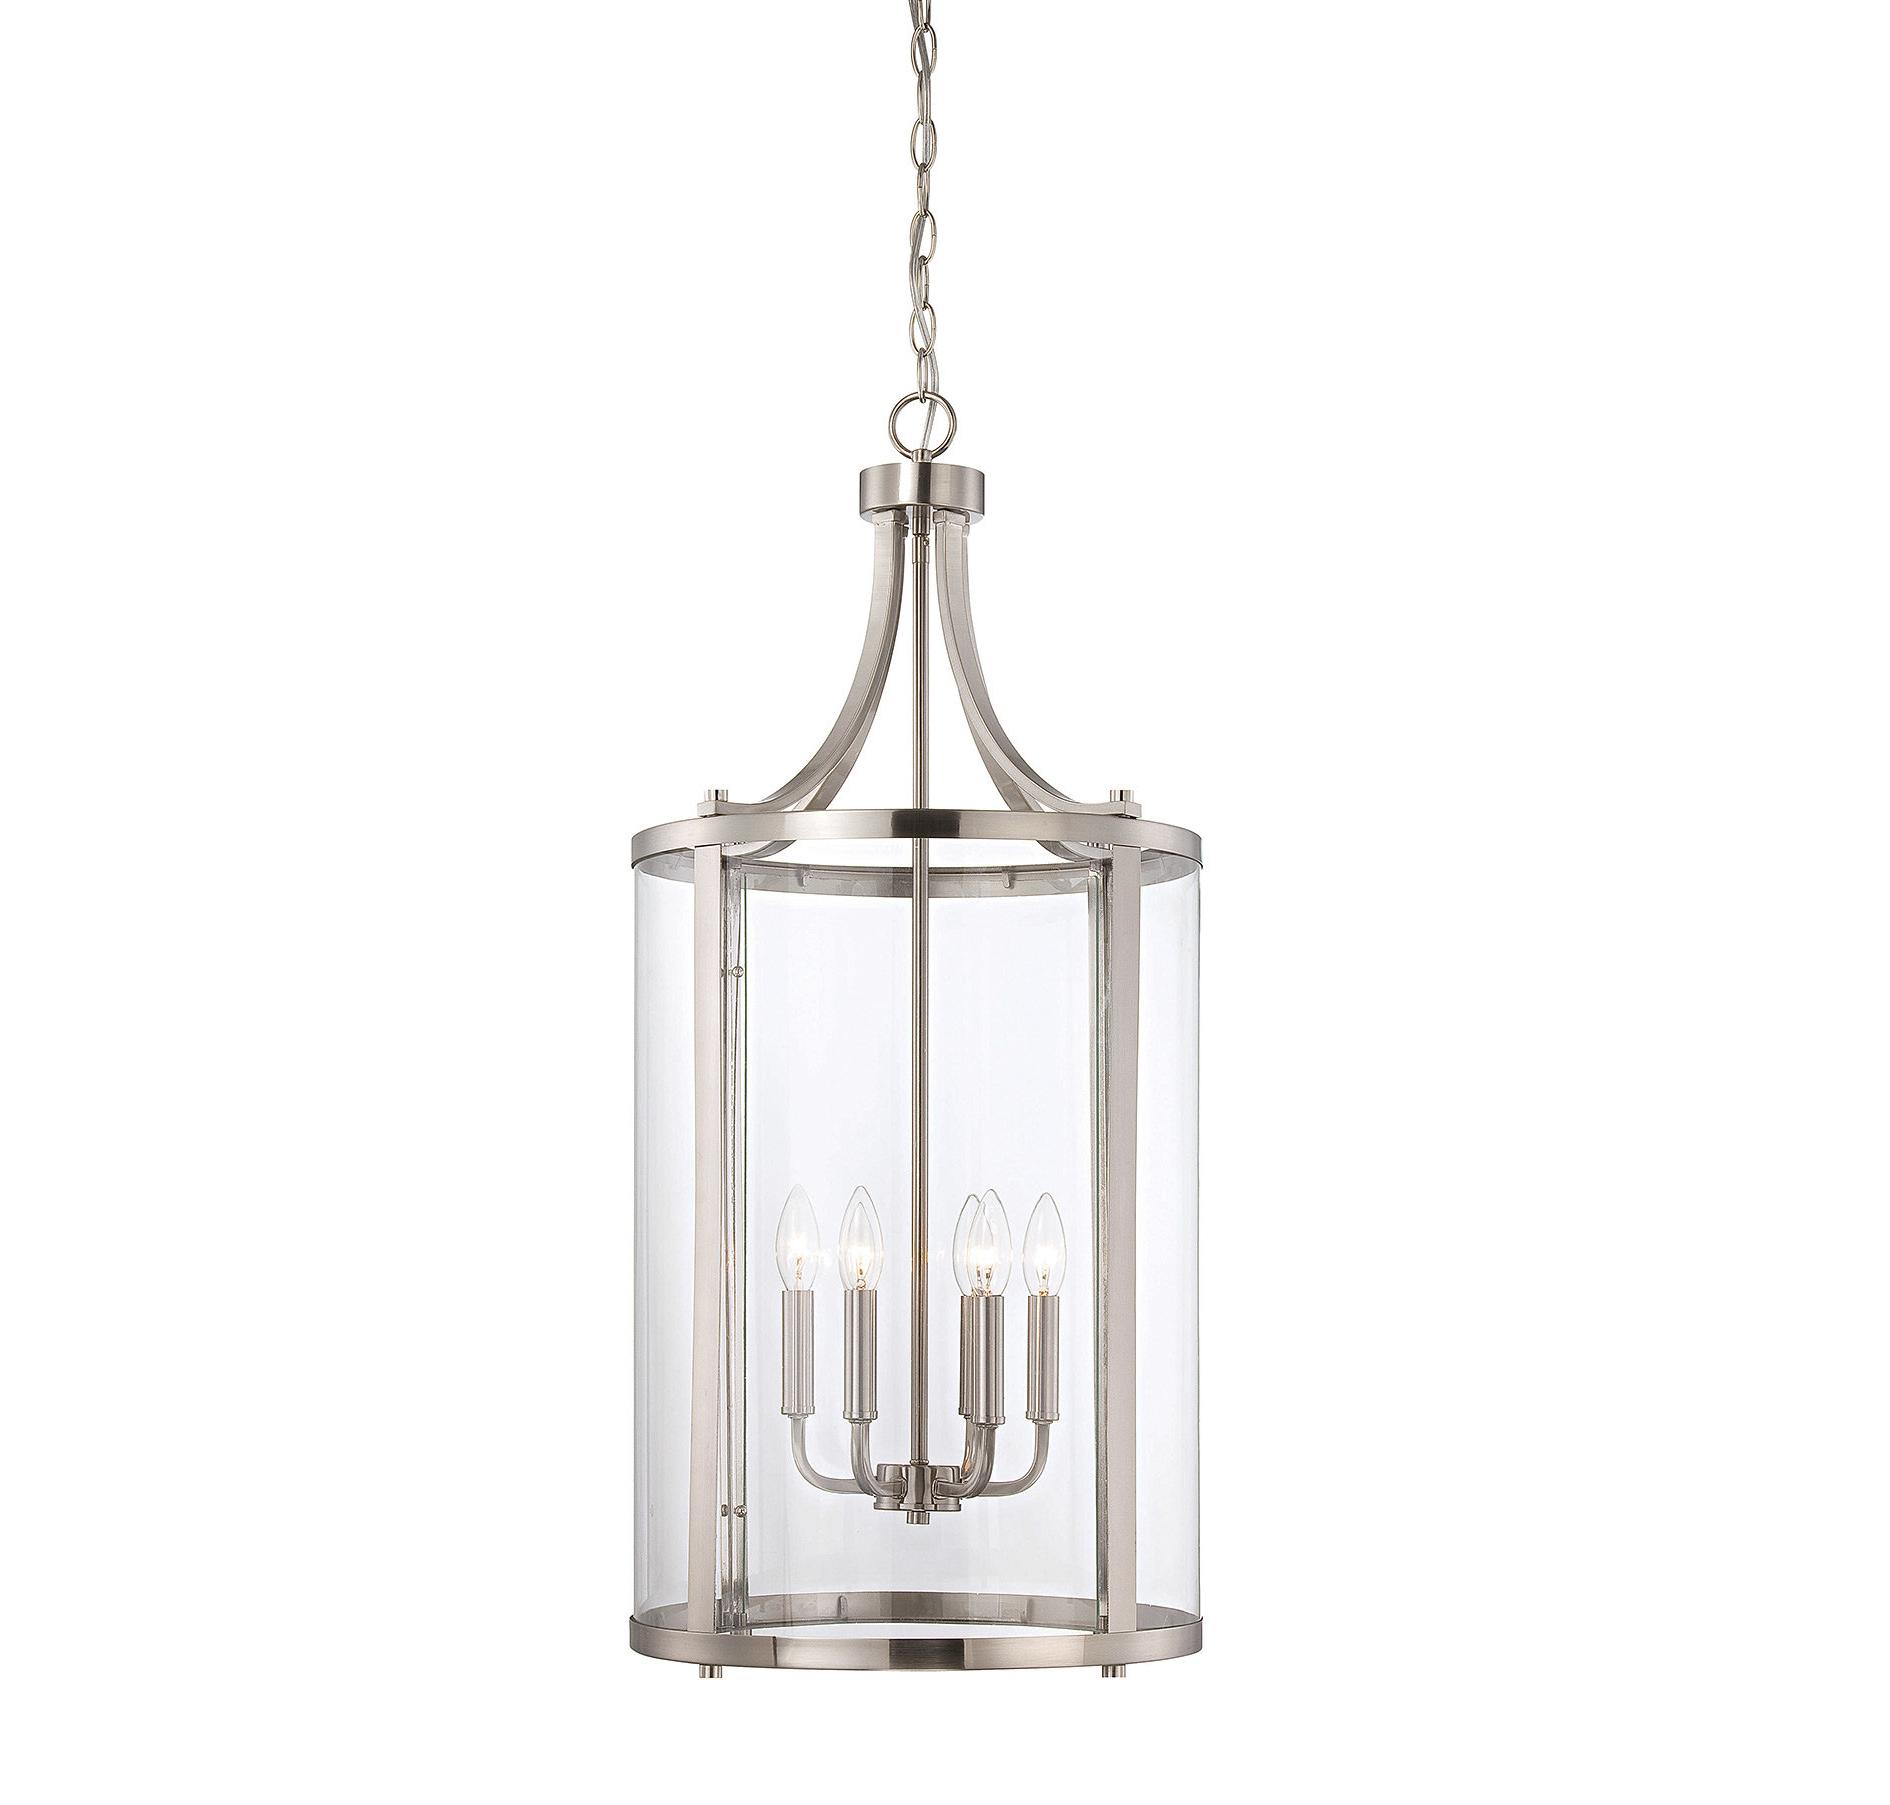 Brookville 6 Light Lantern Cylinder Pendant For Most Popular Armande 3 Light Lantern Geometric Pendants (View 8 of 25)